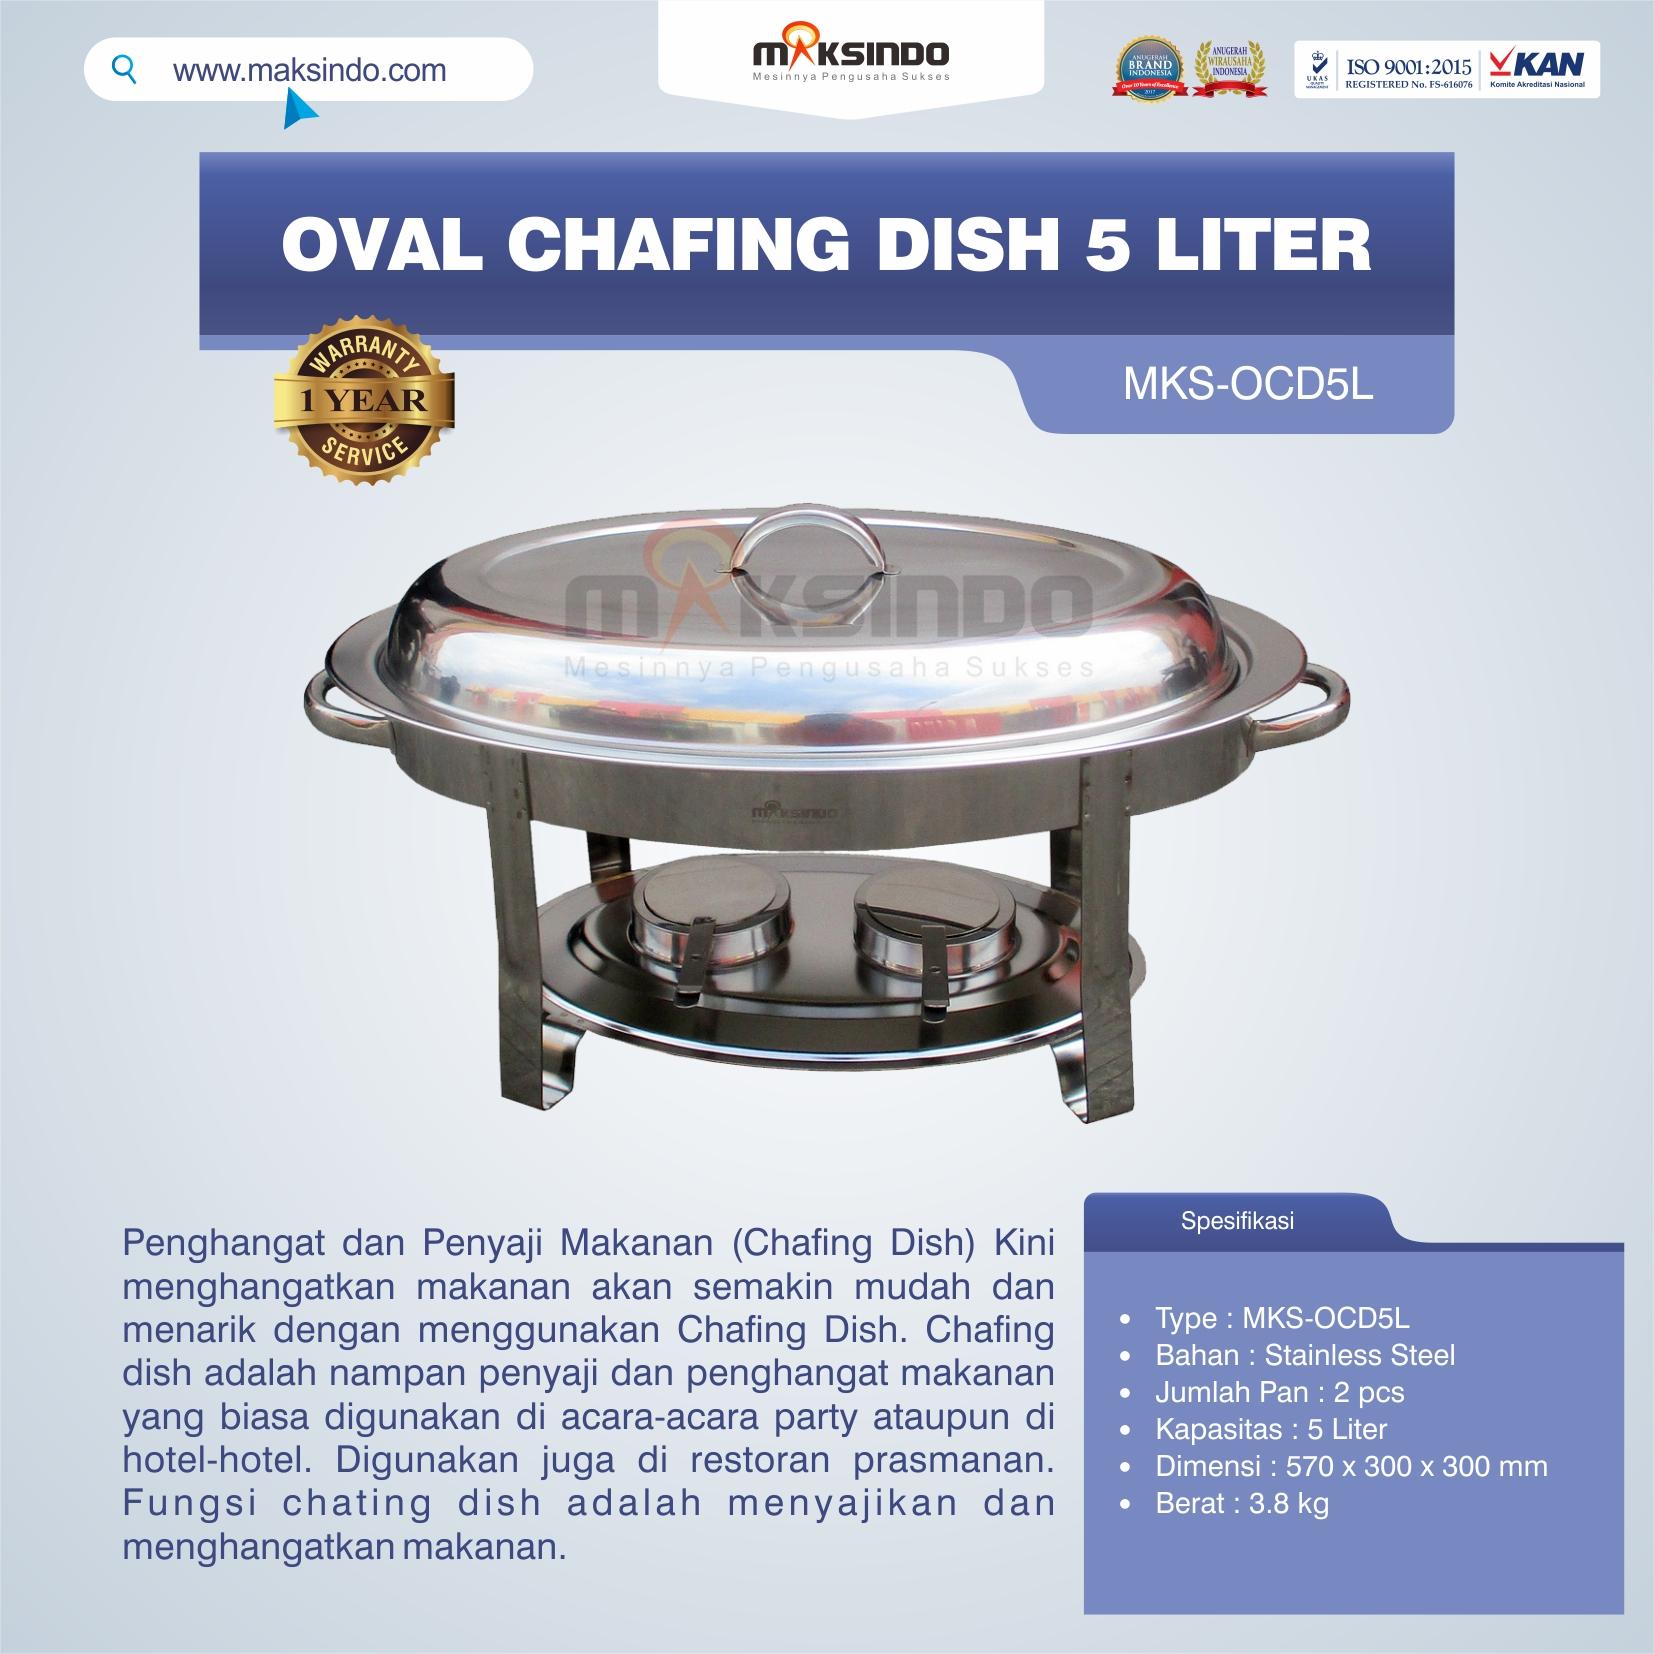 Jual Oval Chafing Dish 5 Liter di Bandung